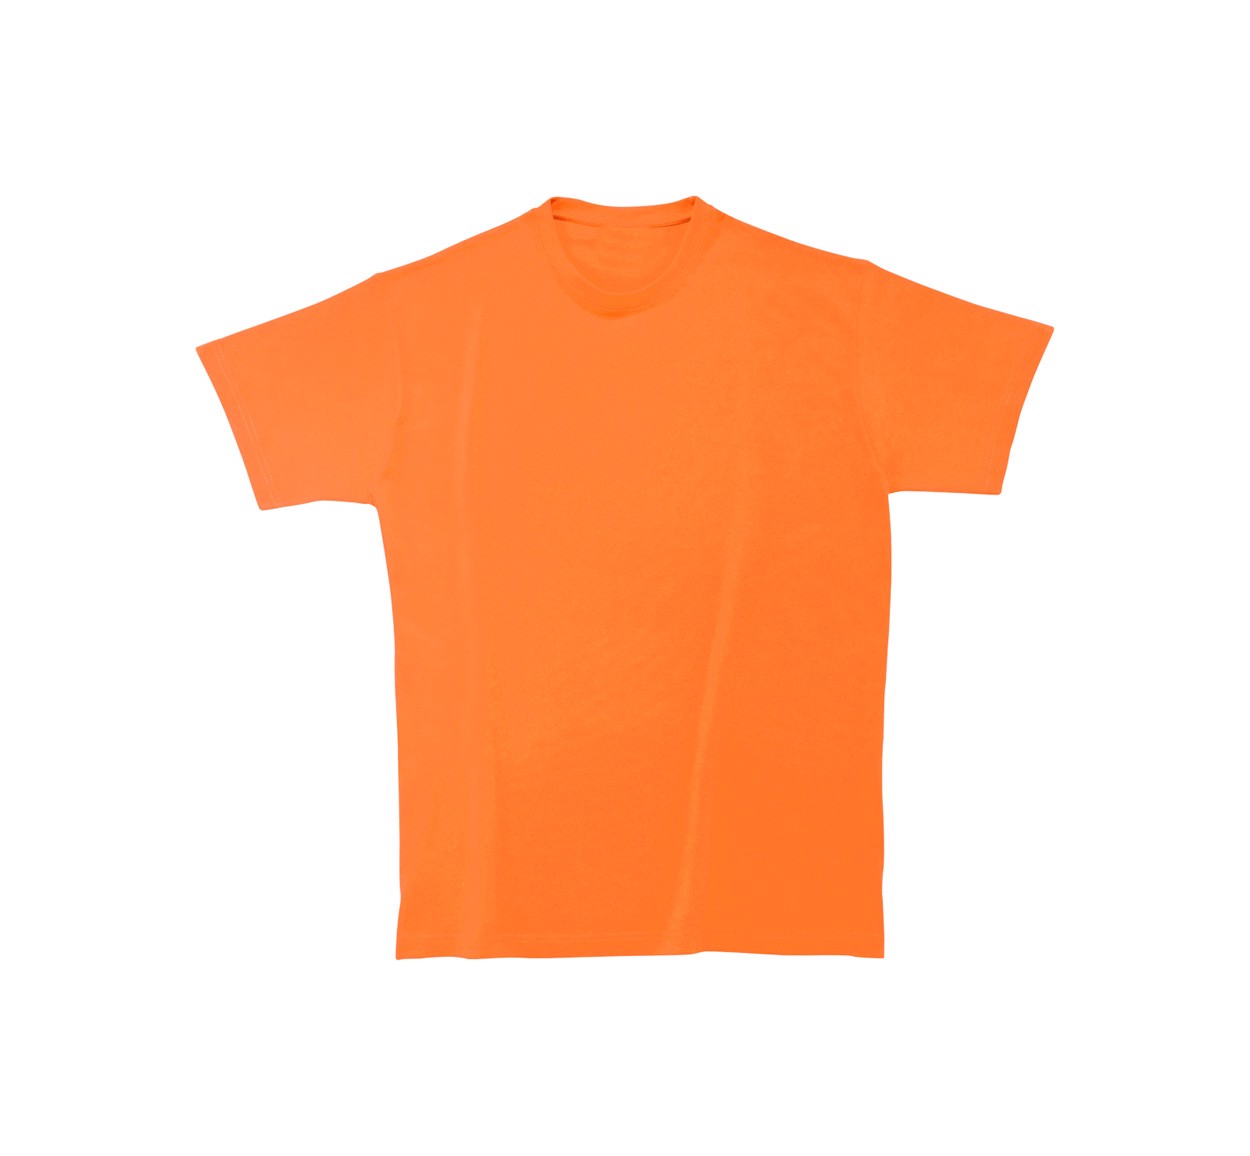 T-Shirt Heavy Cotton - Orange / S